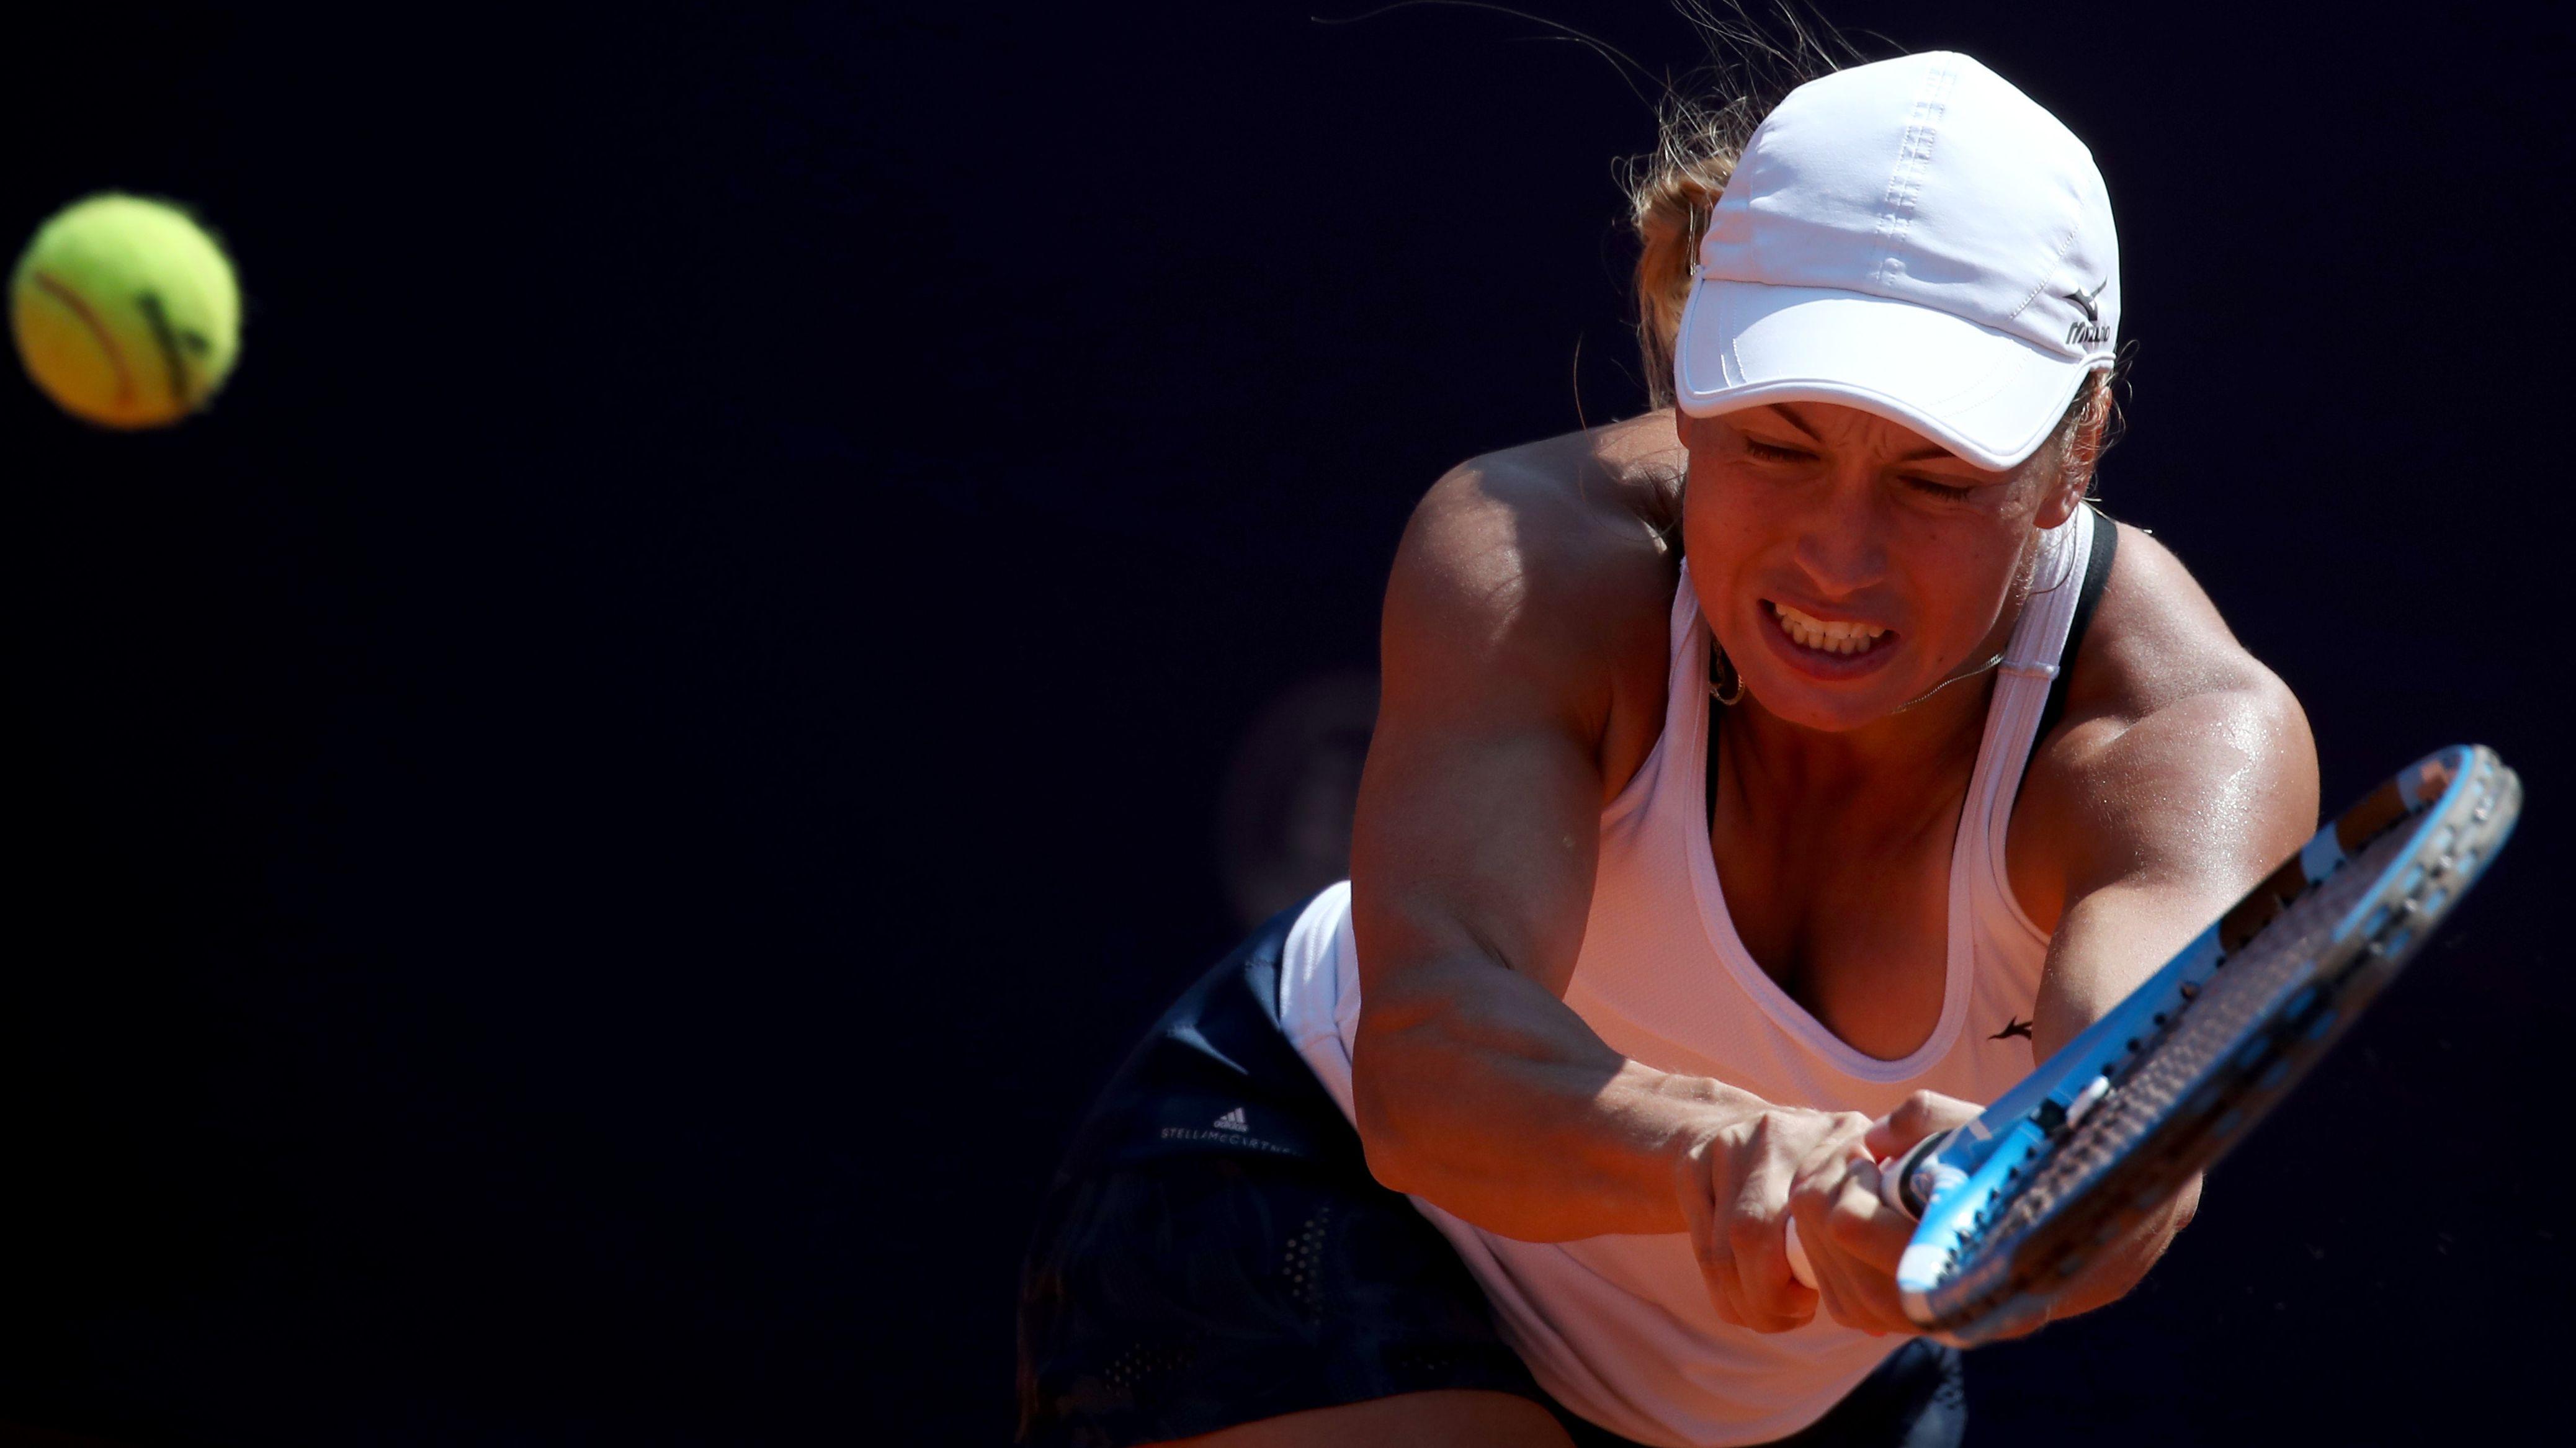 Tennis: WTA-Tour - Nürnberg, Einzel, Damen, Finale, Zidansek (Slowenien) - Putinzewa (Kasachstan)